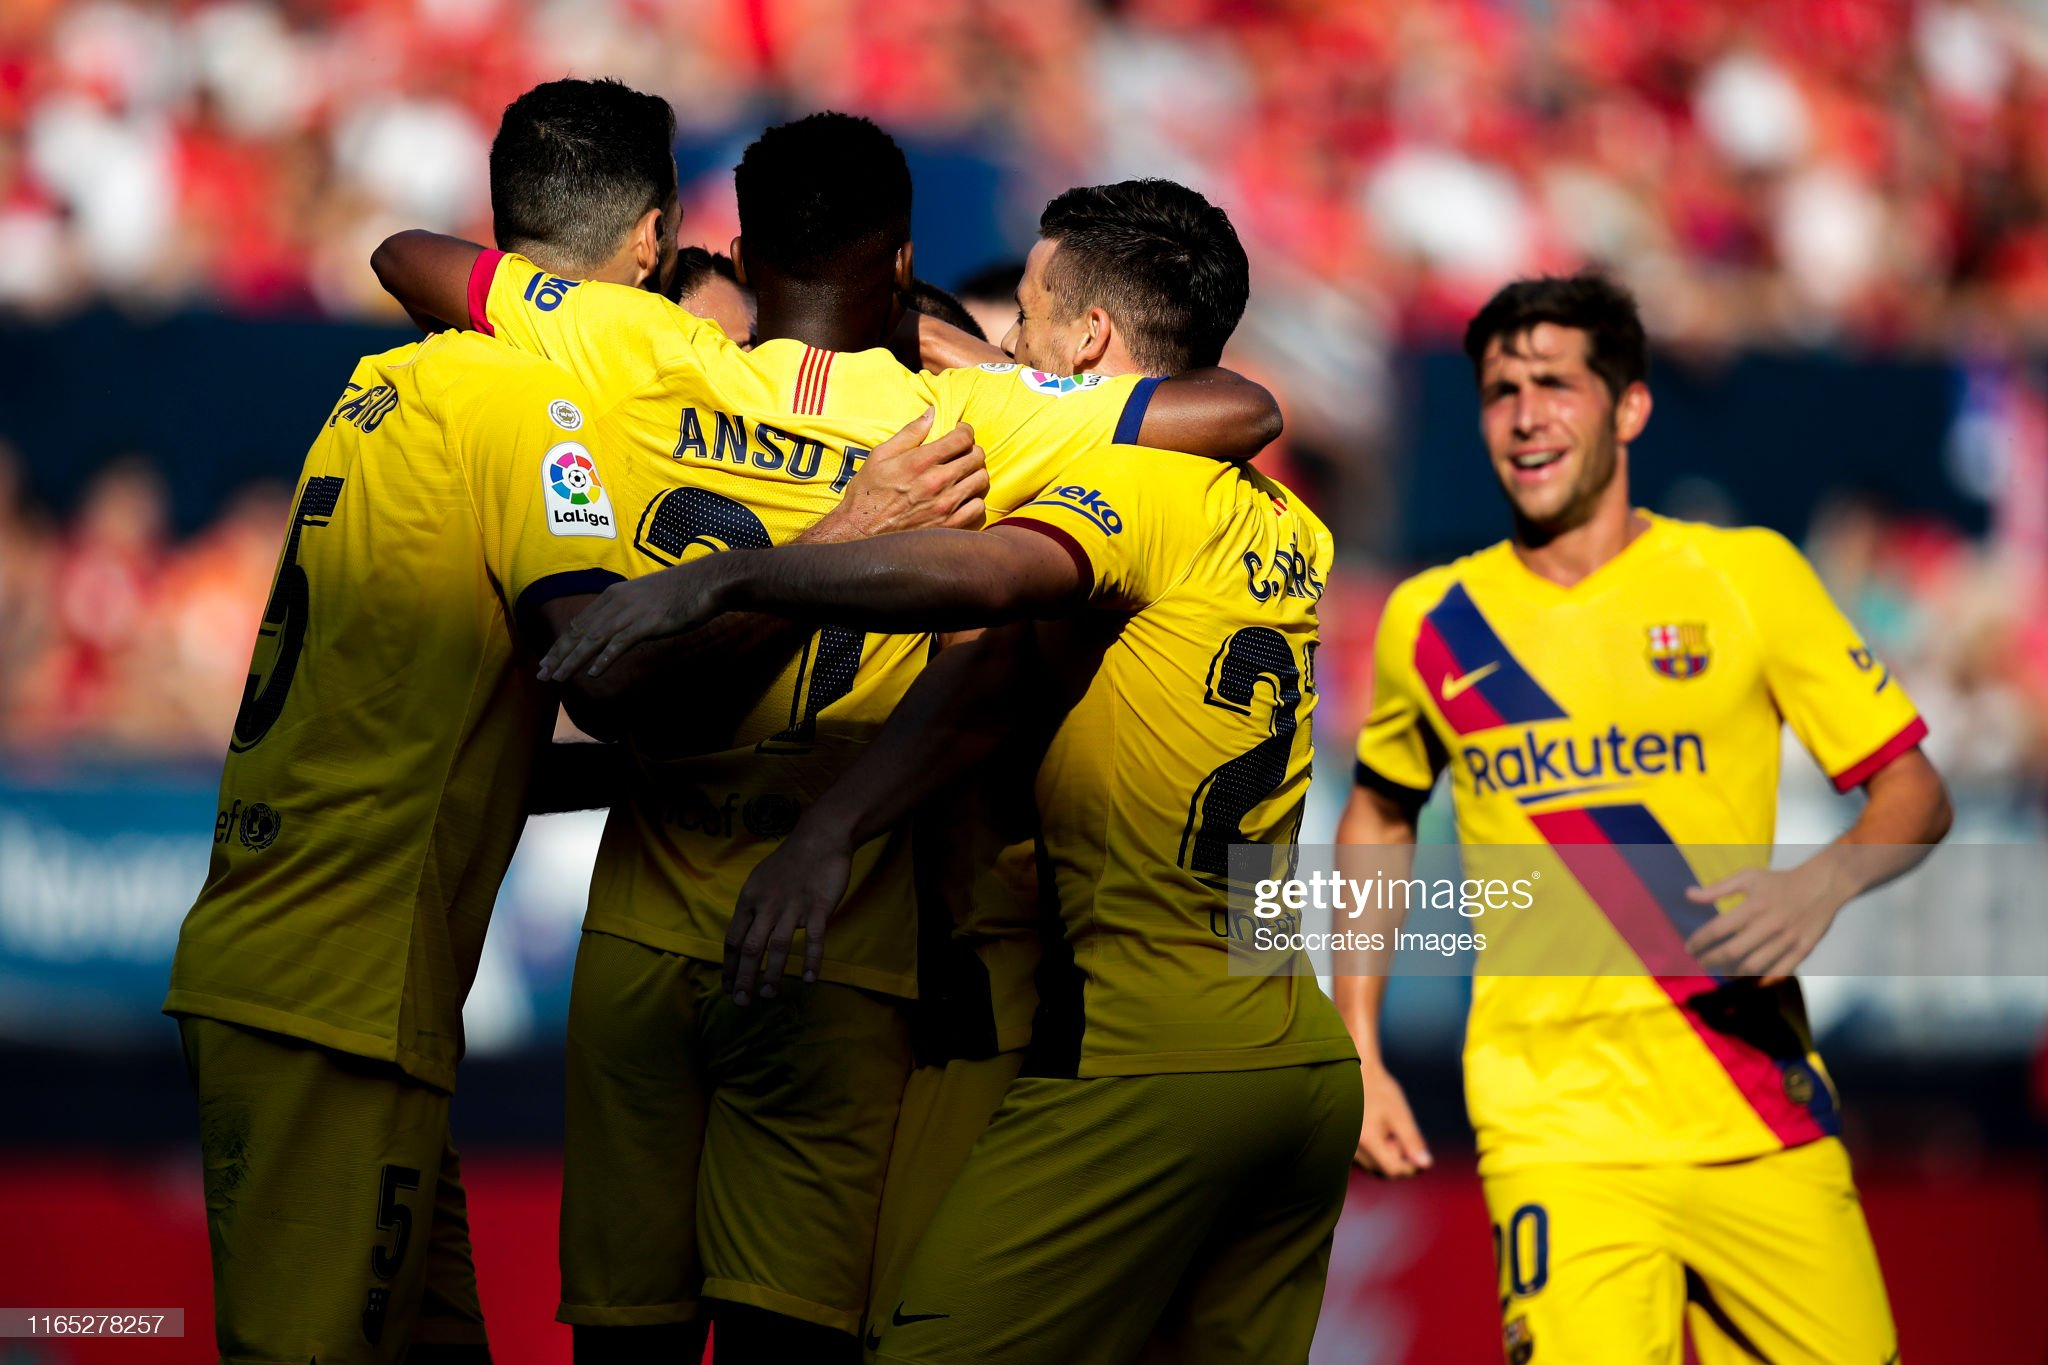 صور مباراة : أوساسونا - برشلونة 2-2 ( 31-08-2019 )  Ansu-fati-of-fc-barcelona-sergio-busquets-of-fc-barcelona-jordi-alba-picture-id1165278257?s=2048x2048